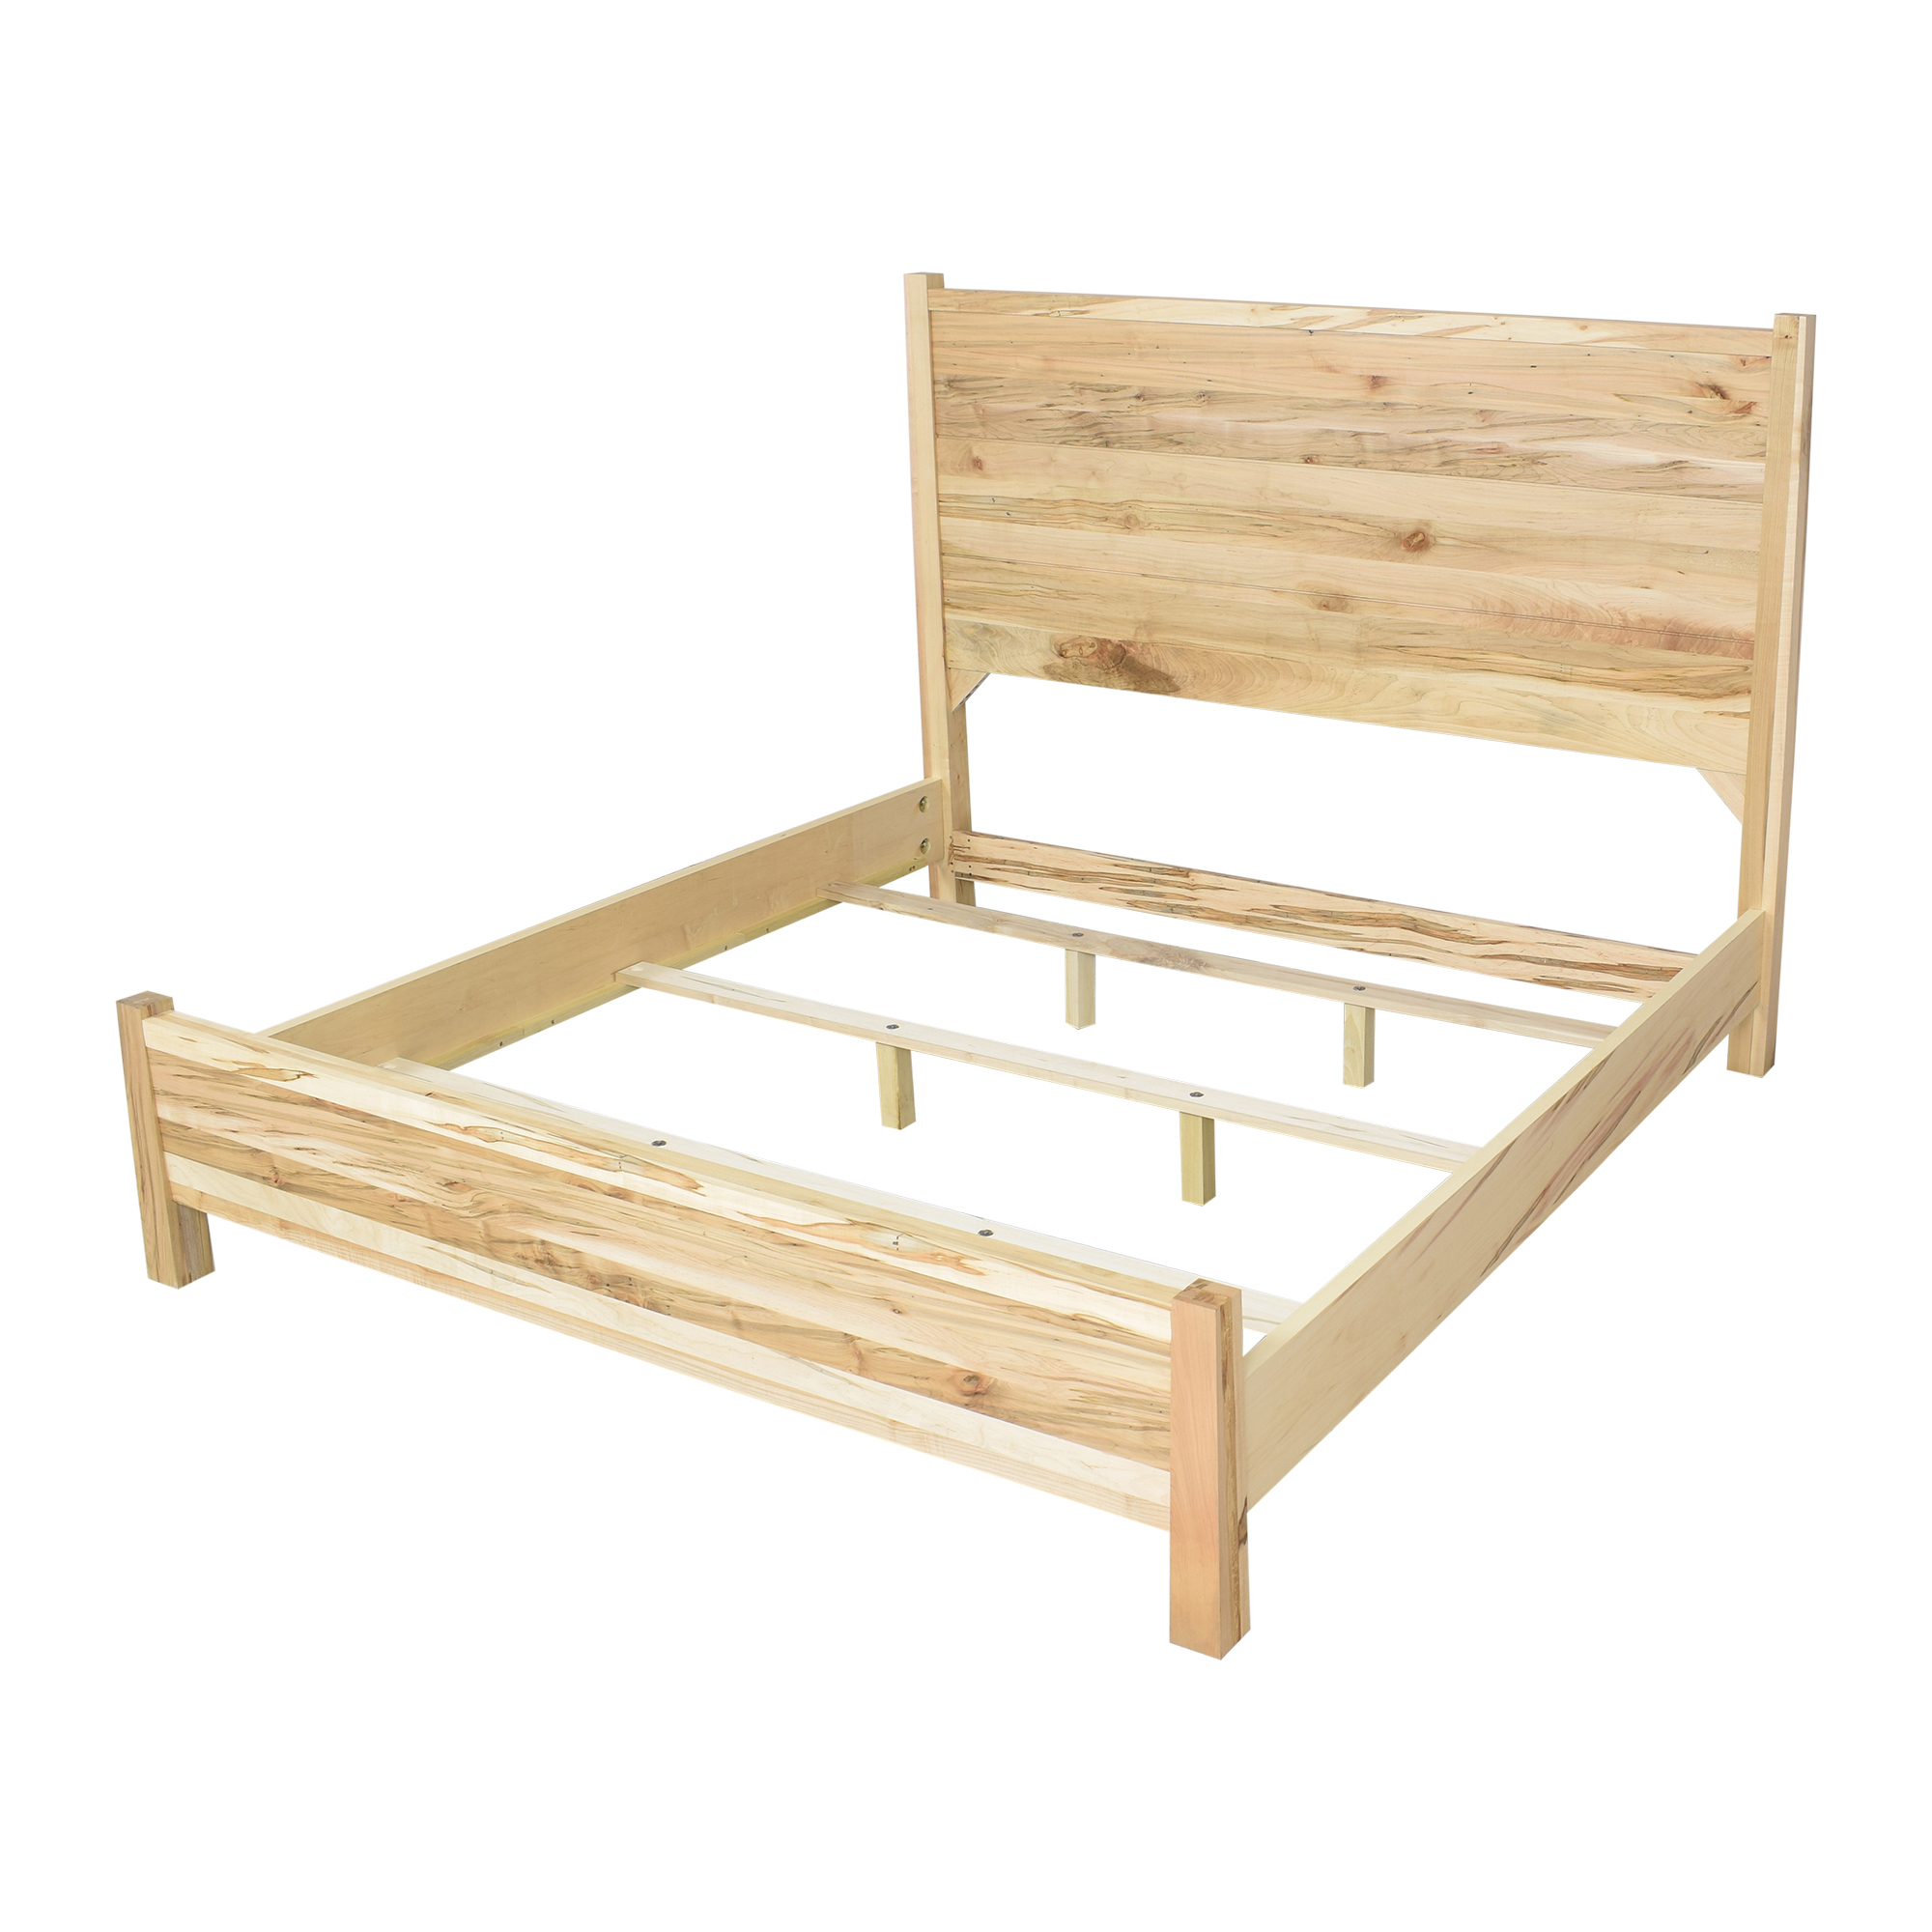 Bassett Furniture Heritage King Bed / Beds